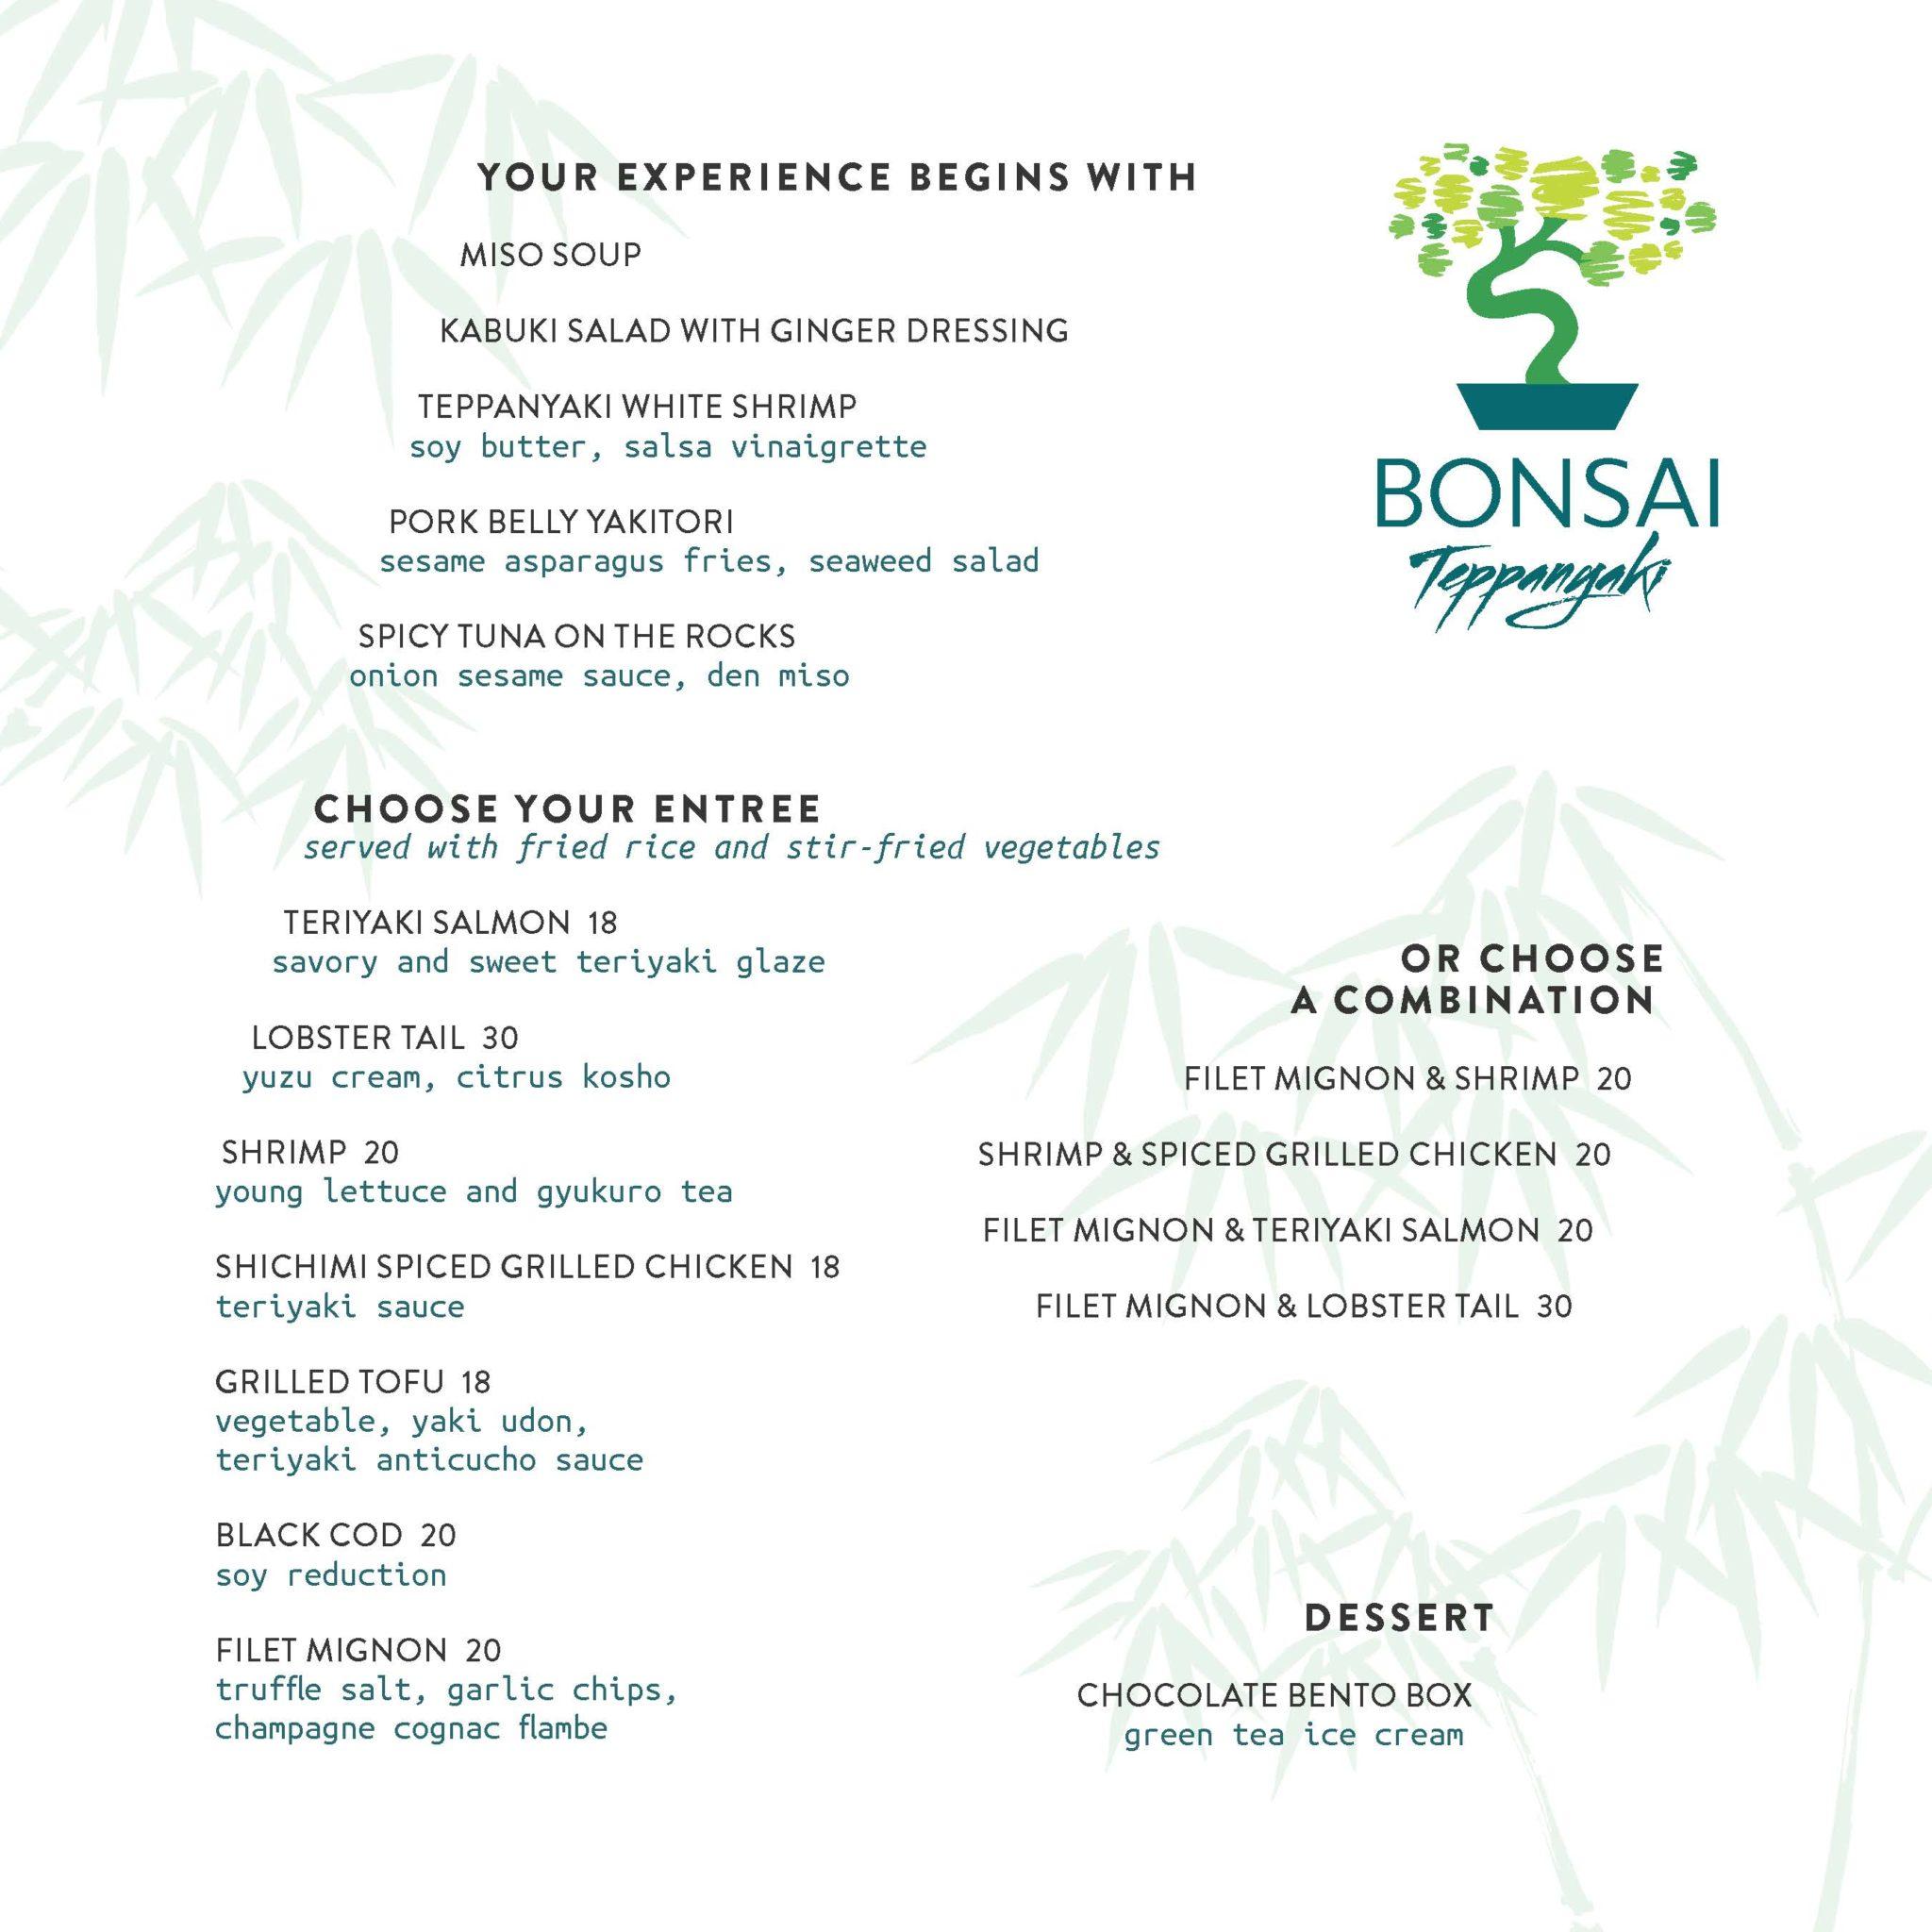 carnival horizon to debut teppanyaki restaurant talkingcruise